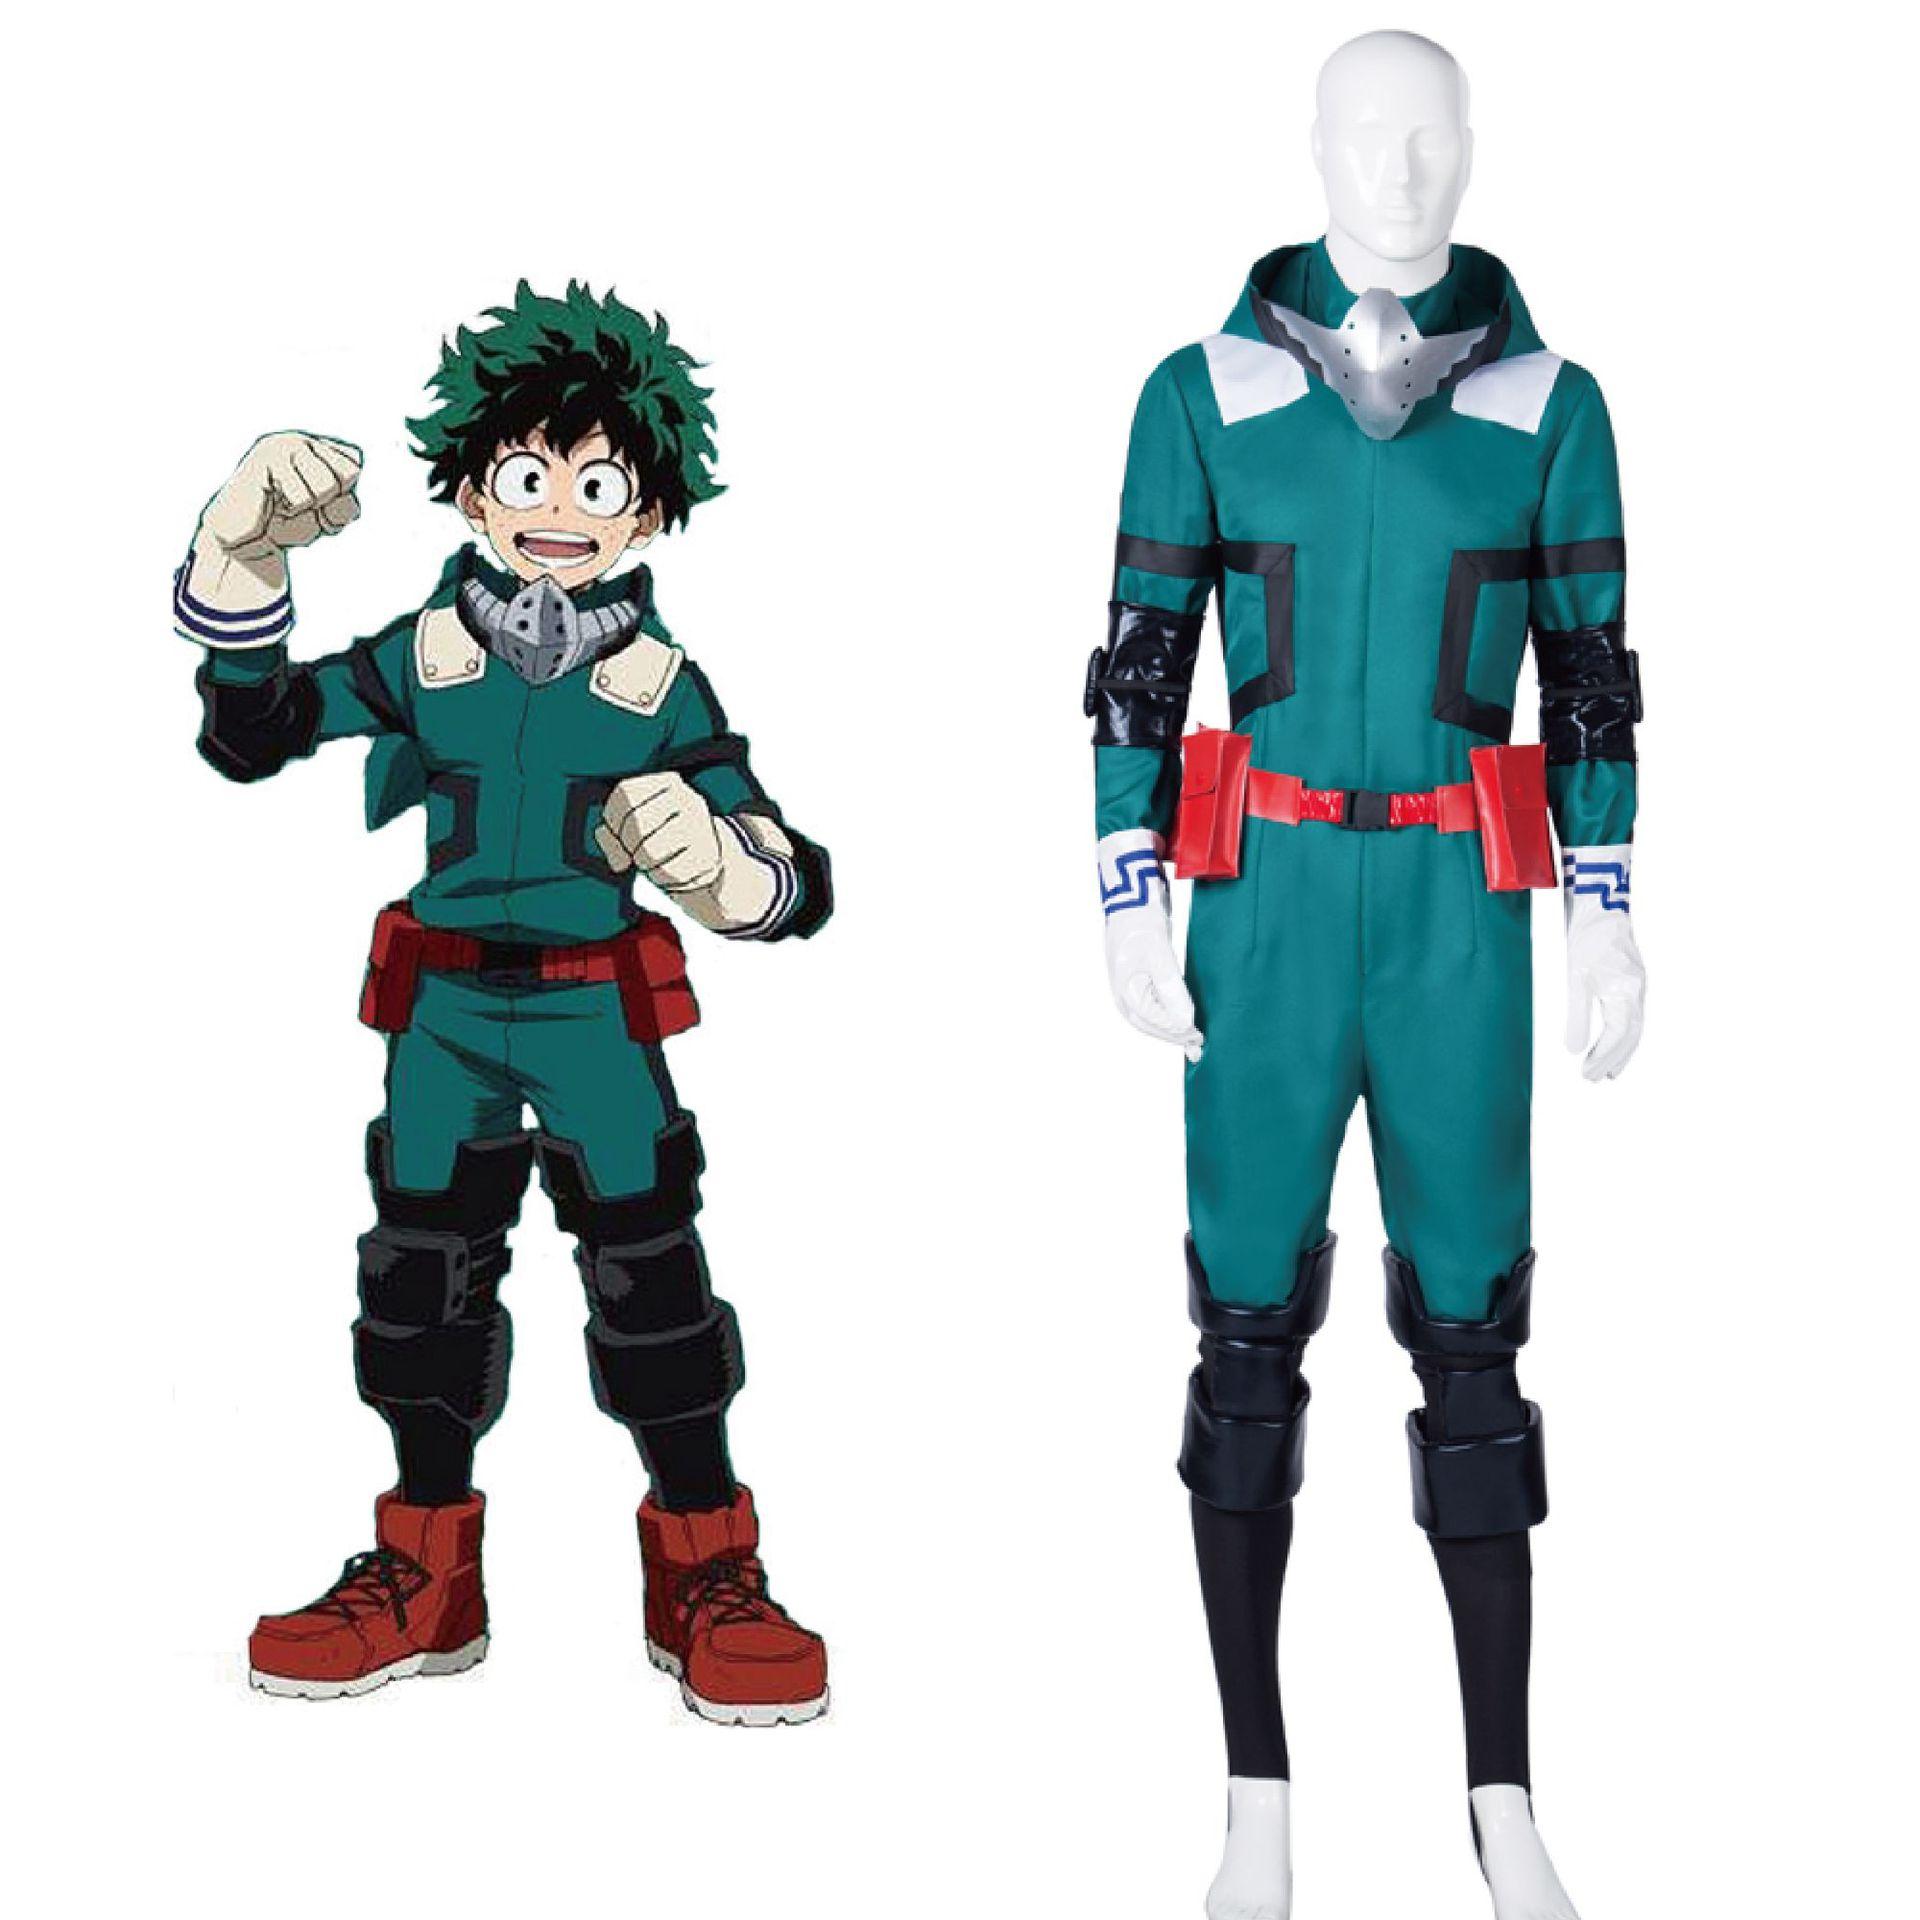 Anime My Hero Academia Boku no Hero Academia Midoriya Izuku Deku Cosplay Costume Battle Suit Men Jumpsuit Carnival Full Set